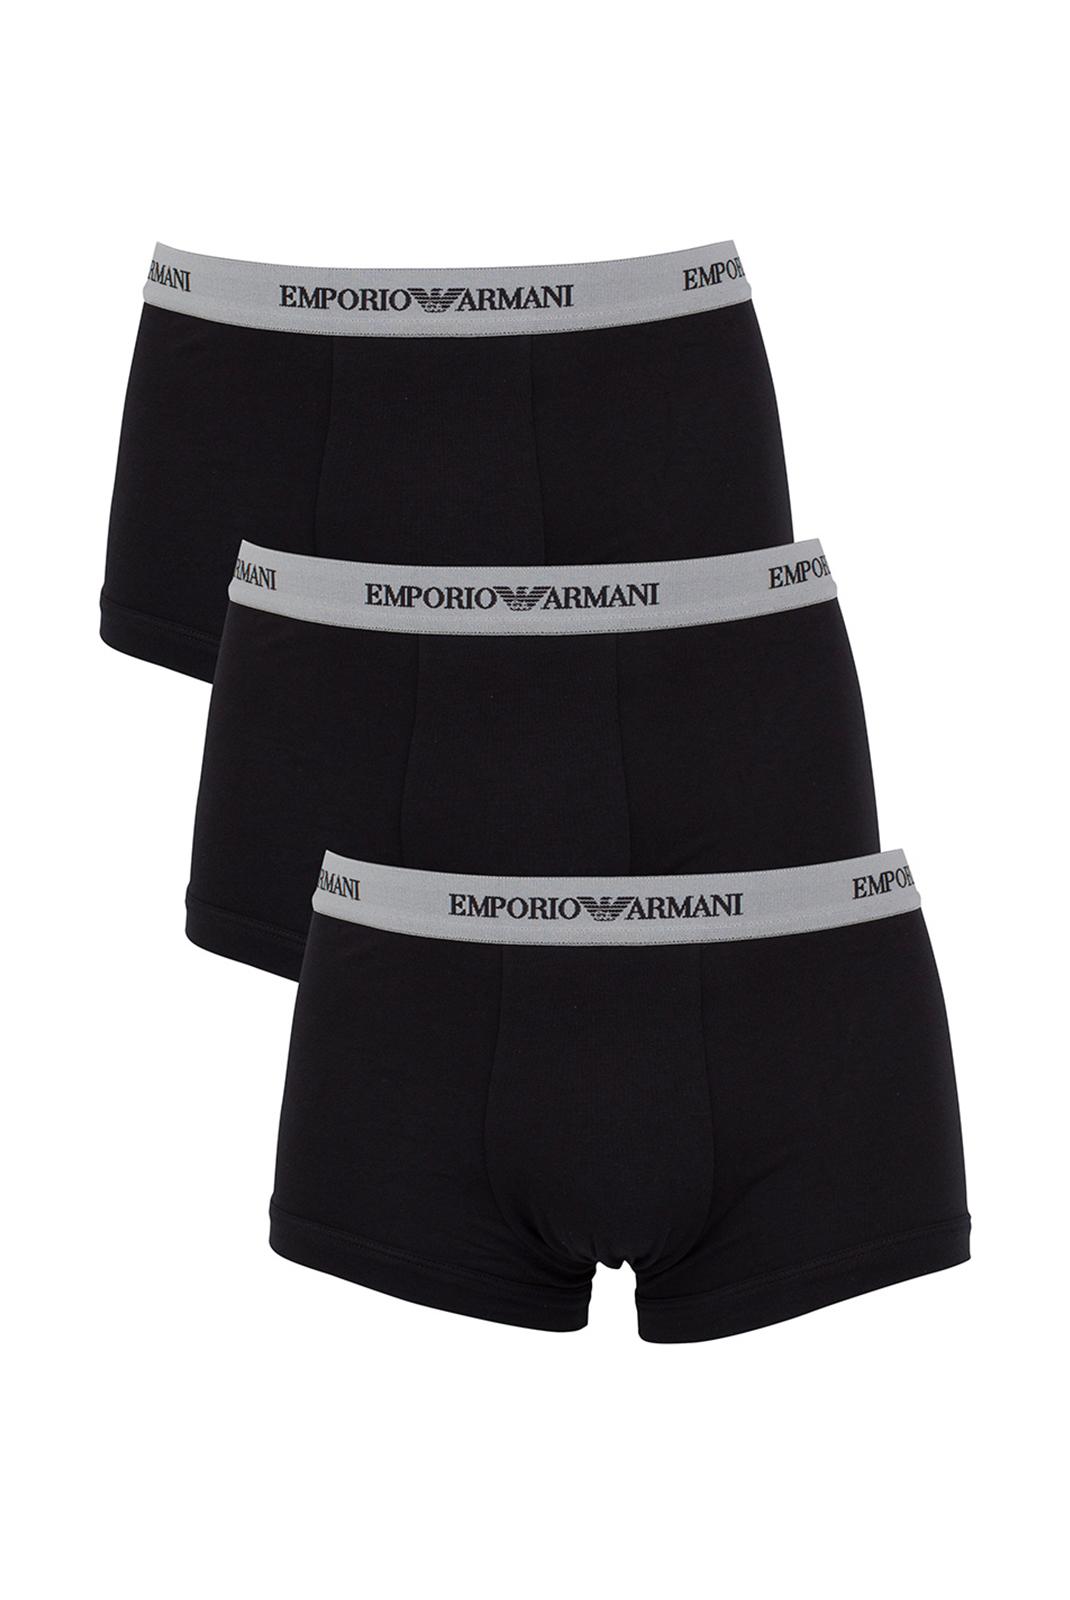 Slips-Caleçons  Emporio armani 111357 CC717 00120 BLACK